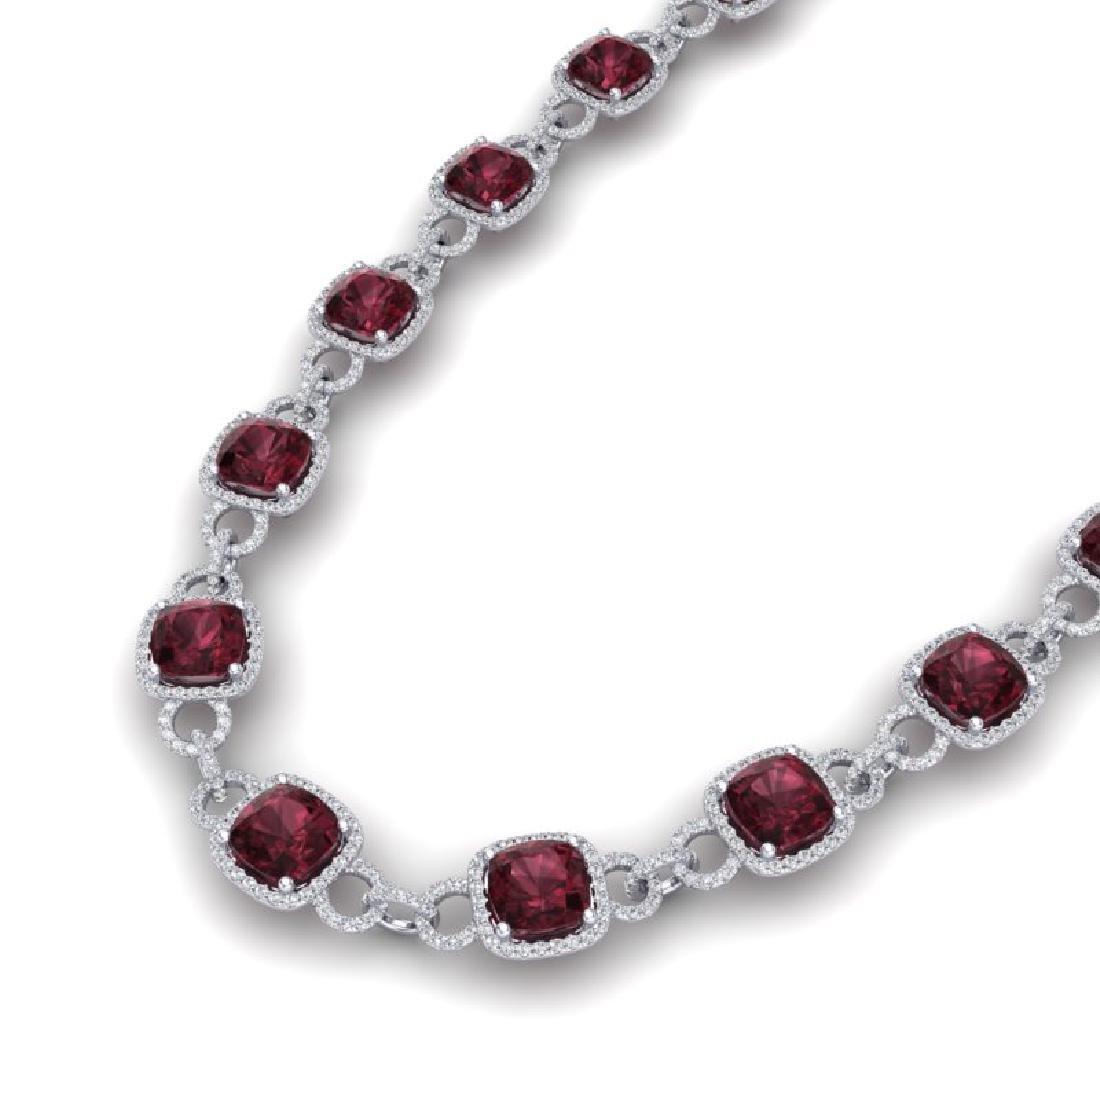 66 CTW Garnet & VS/SI Diamond Necklace 14K White Gold